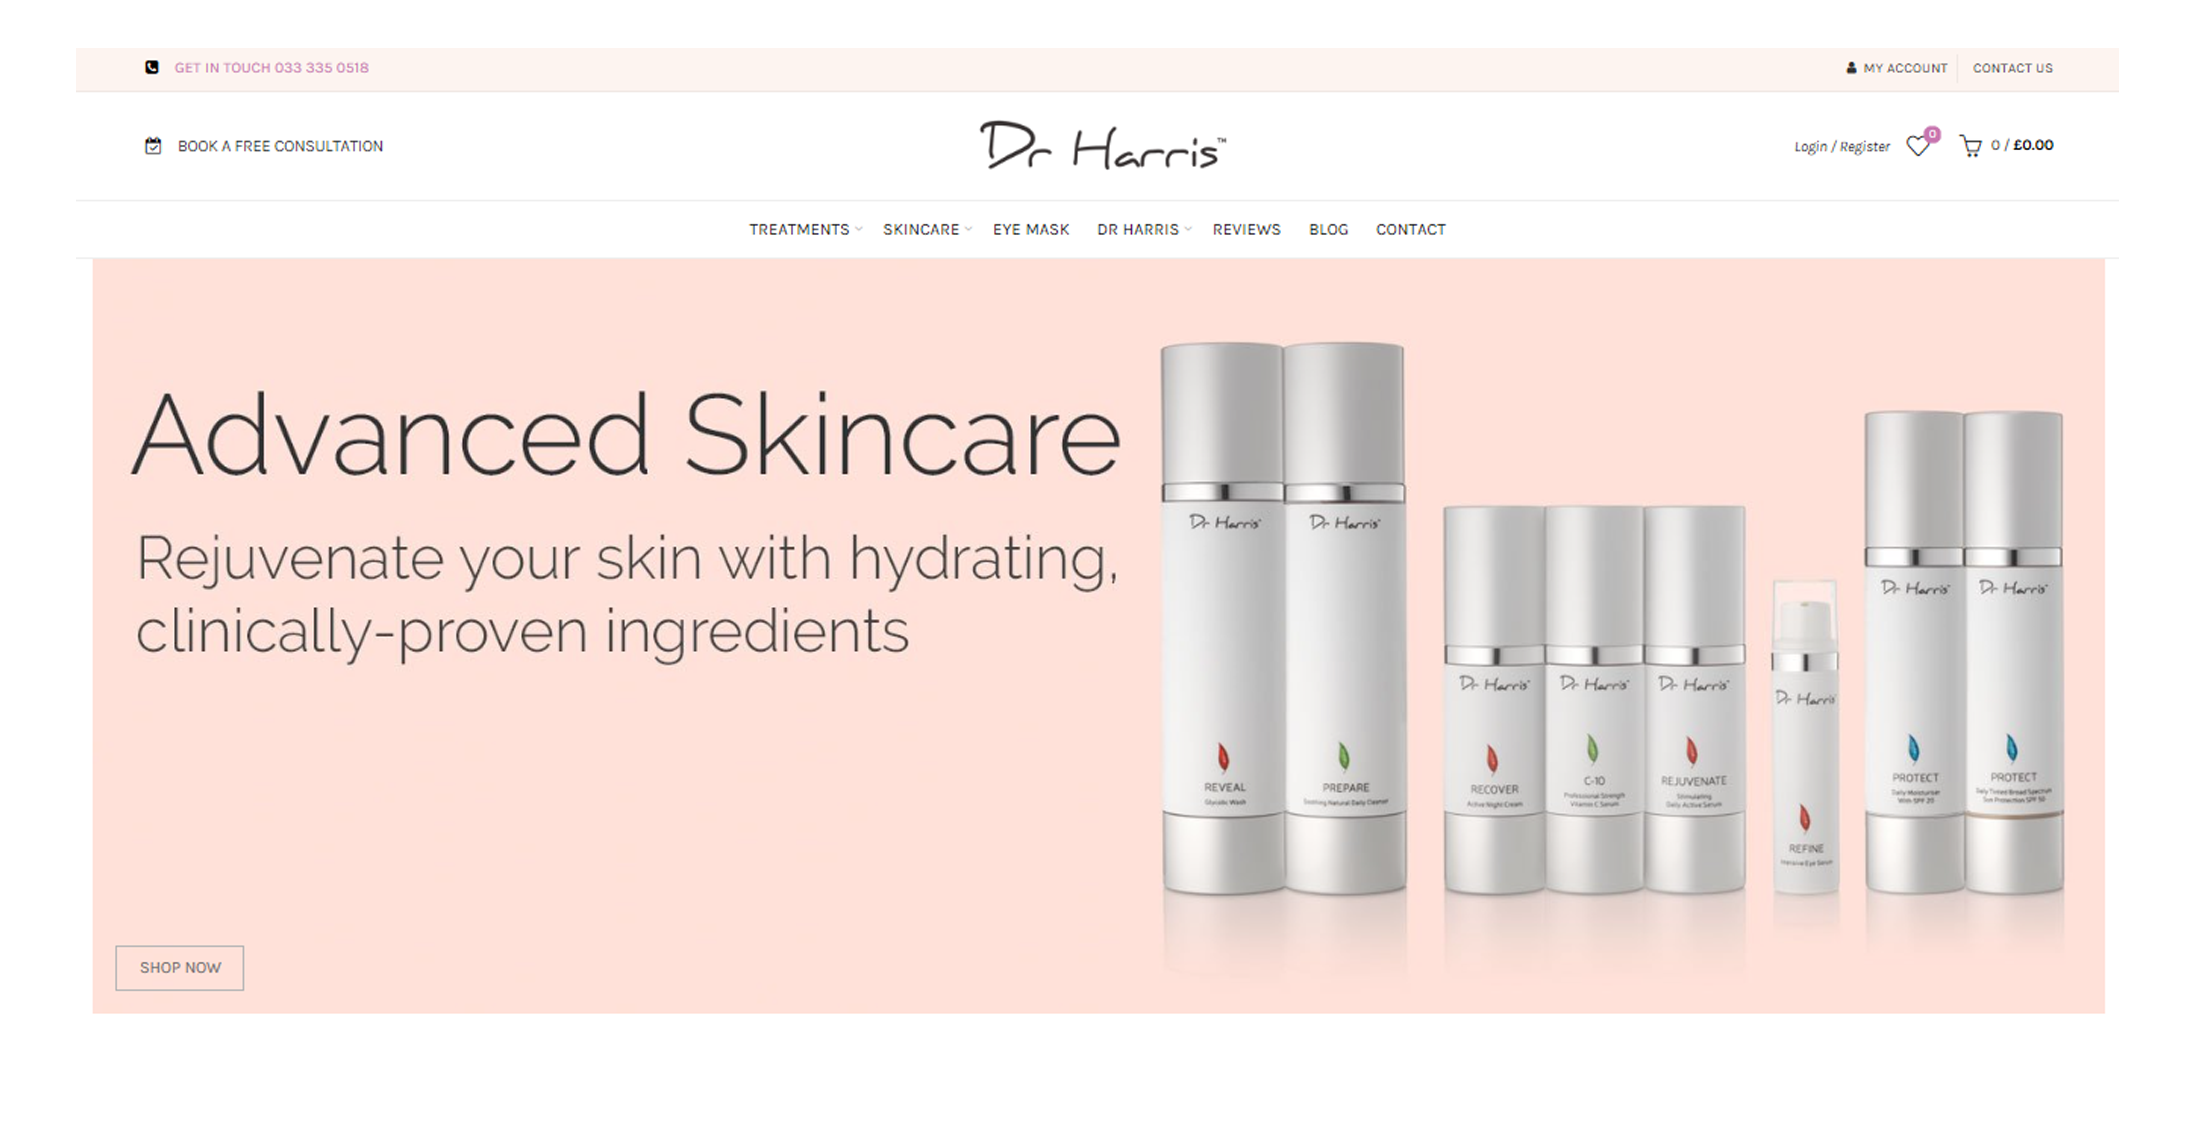 shopify ecommerce web design brighton